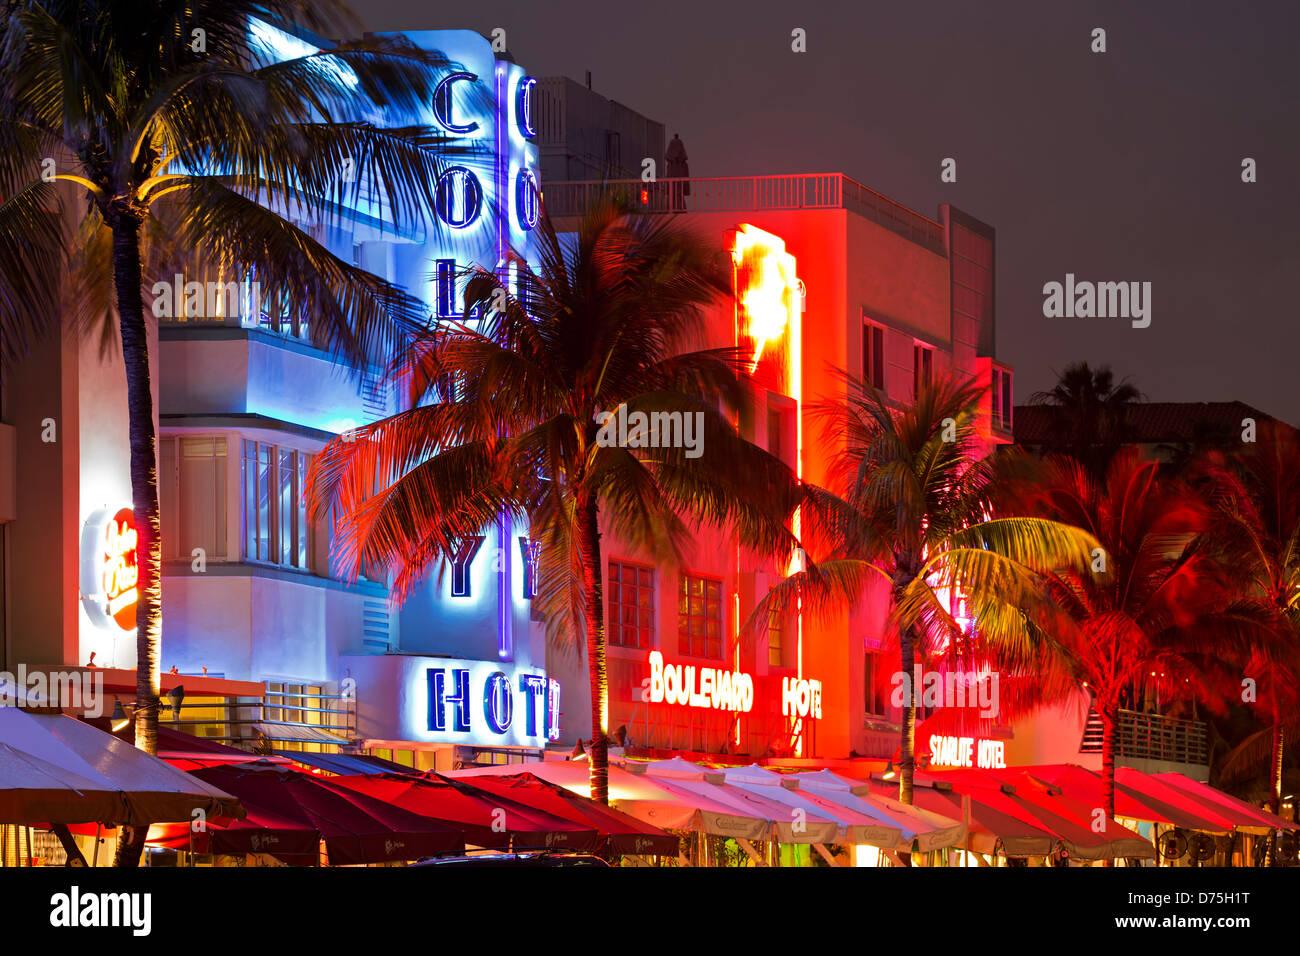 Fila de hoteles, hotel colony, South Beach, Miami Beach, Florida, EE.UU. Imagen De Stock